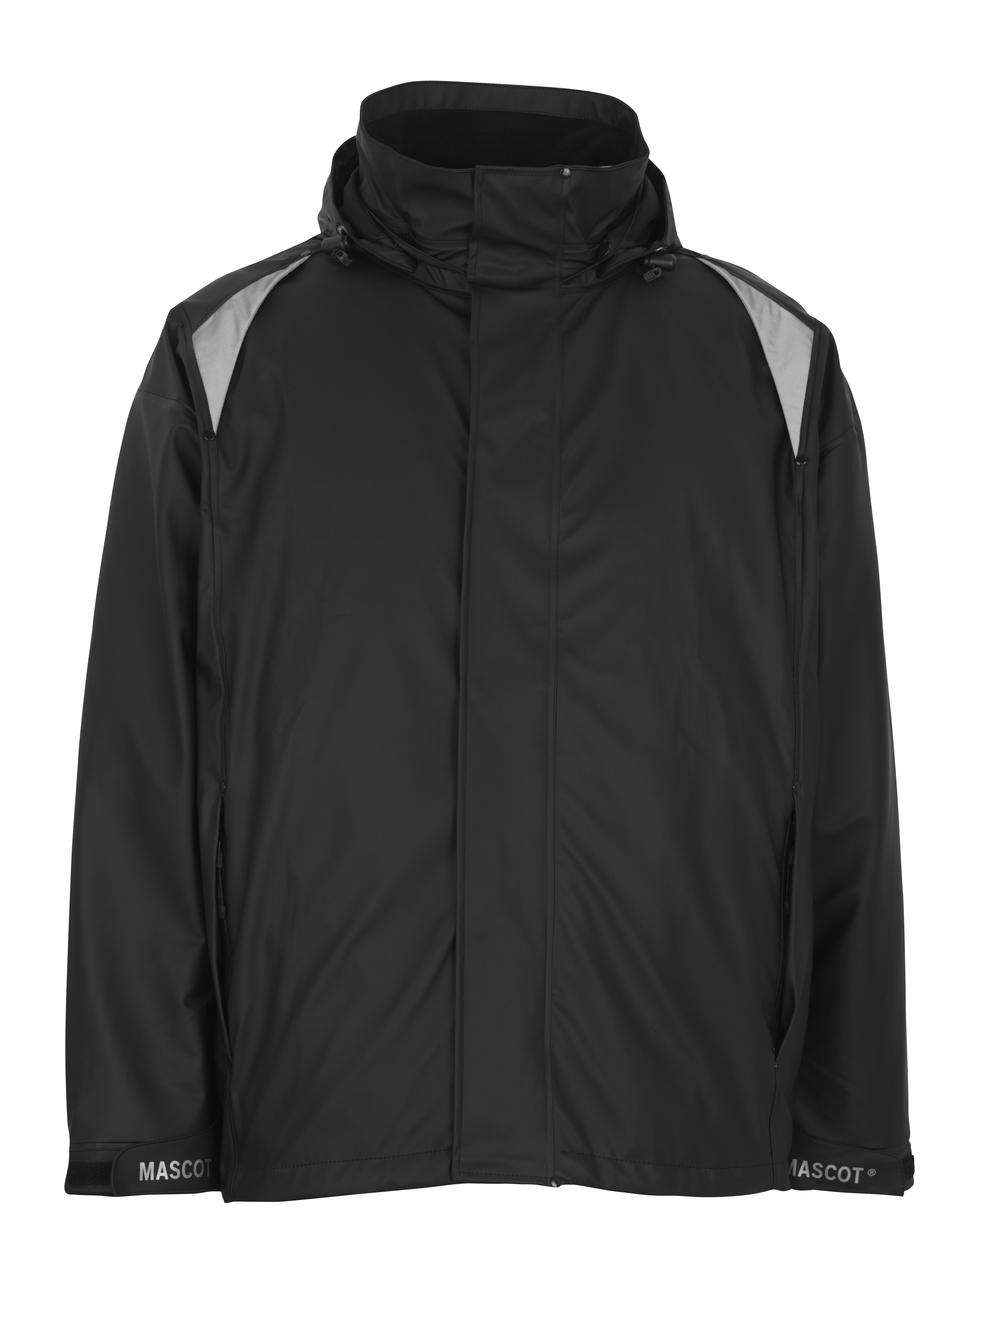 50202-859-09 Veste de pluie - Noir